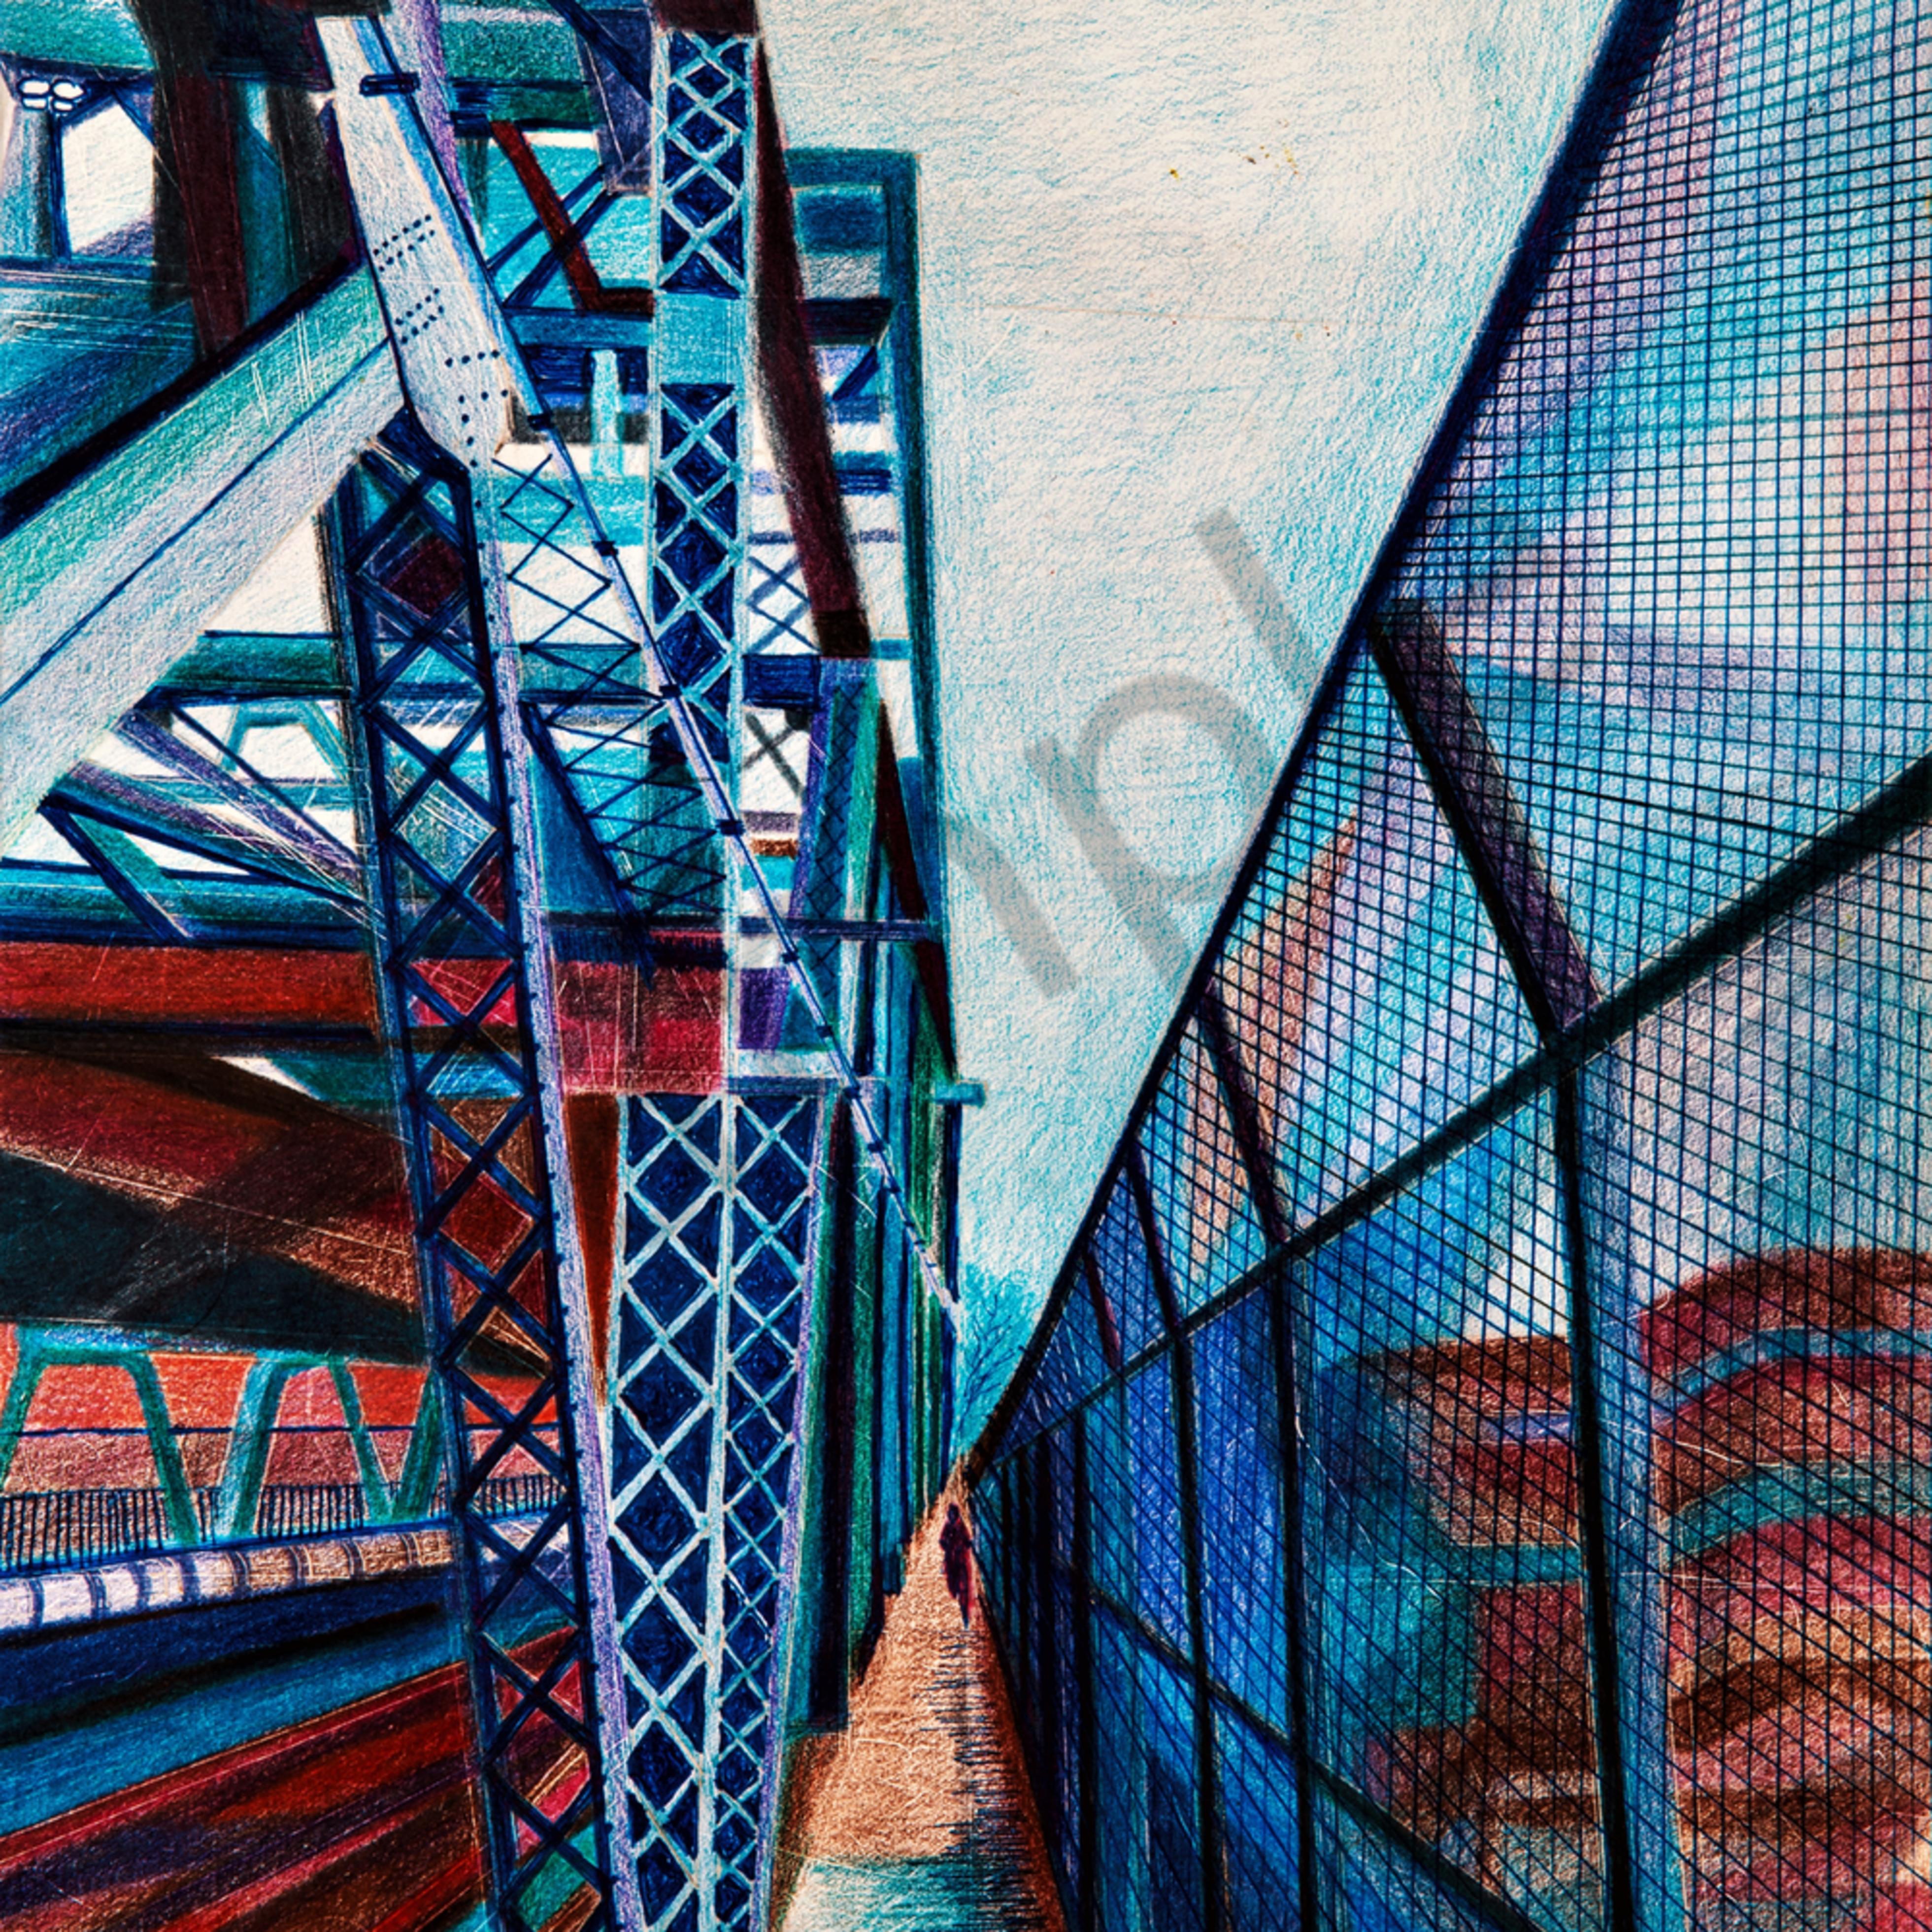 Hjpeg bridge to riverdale tgytv3